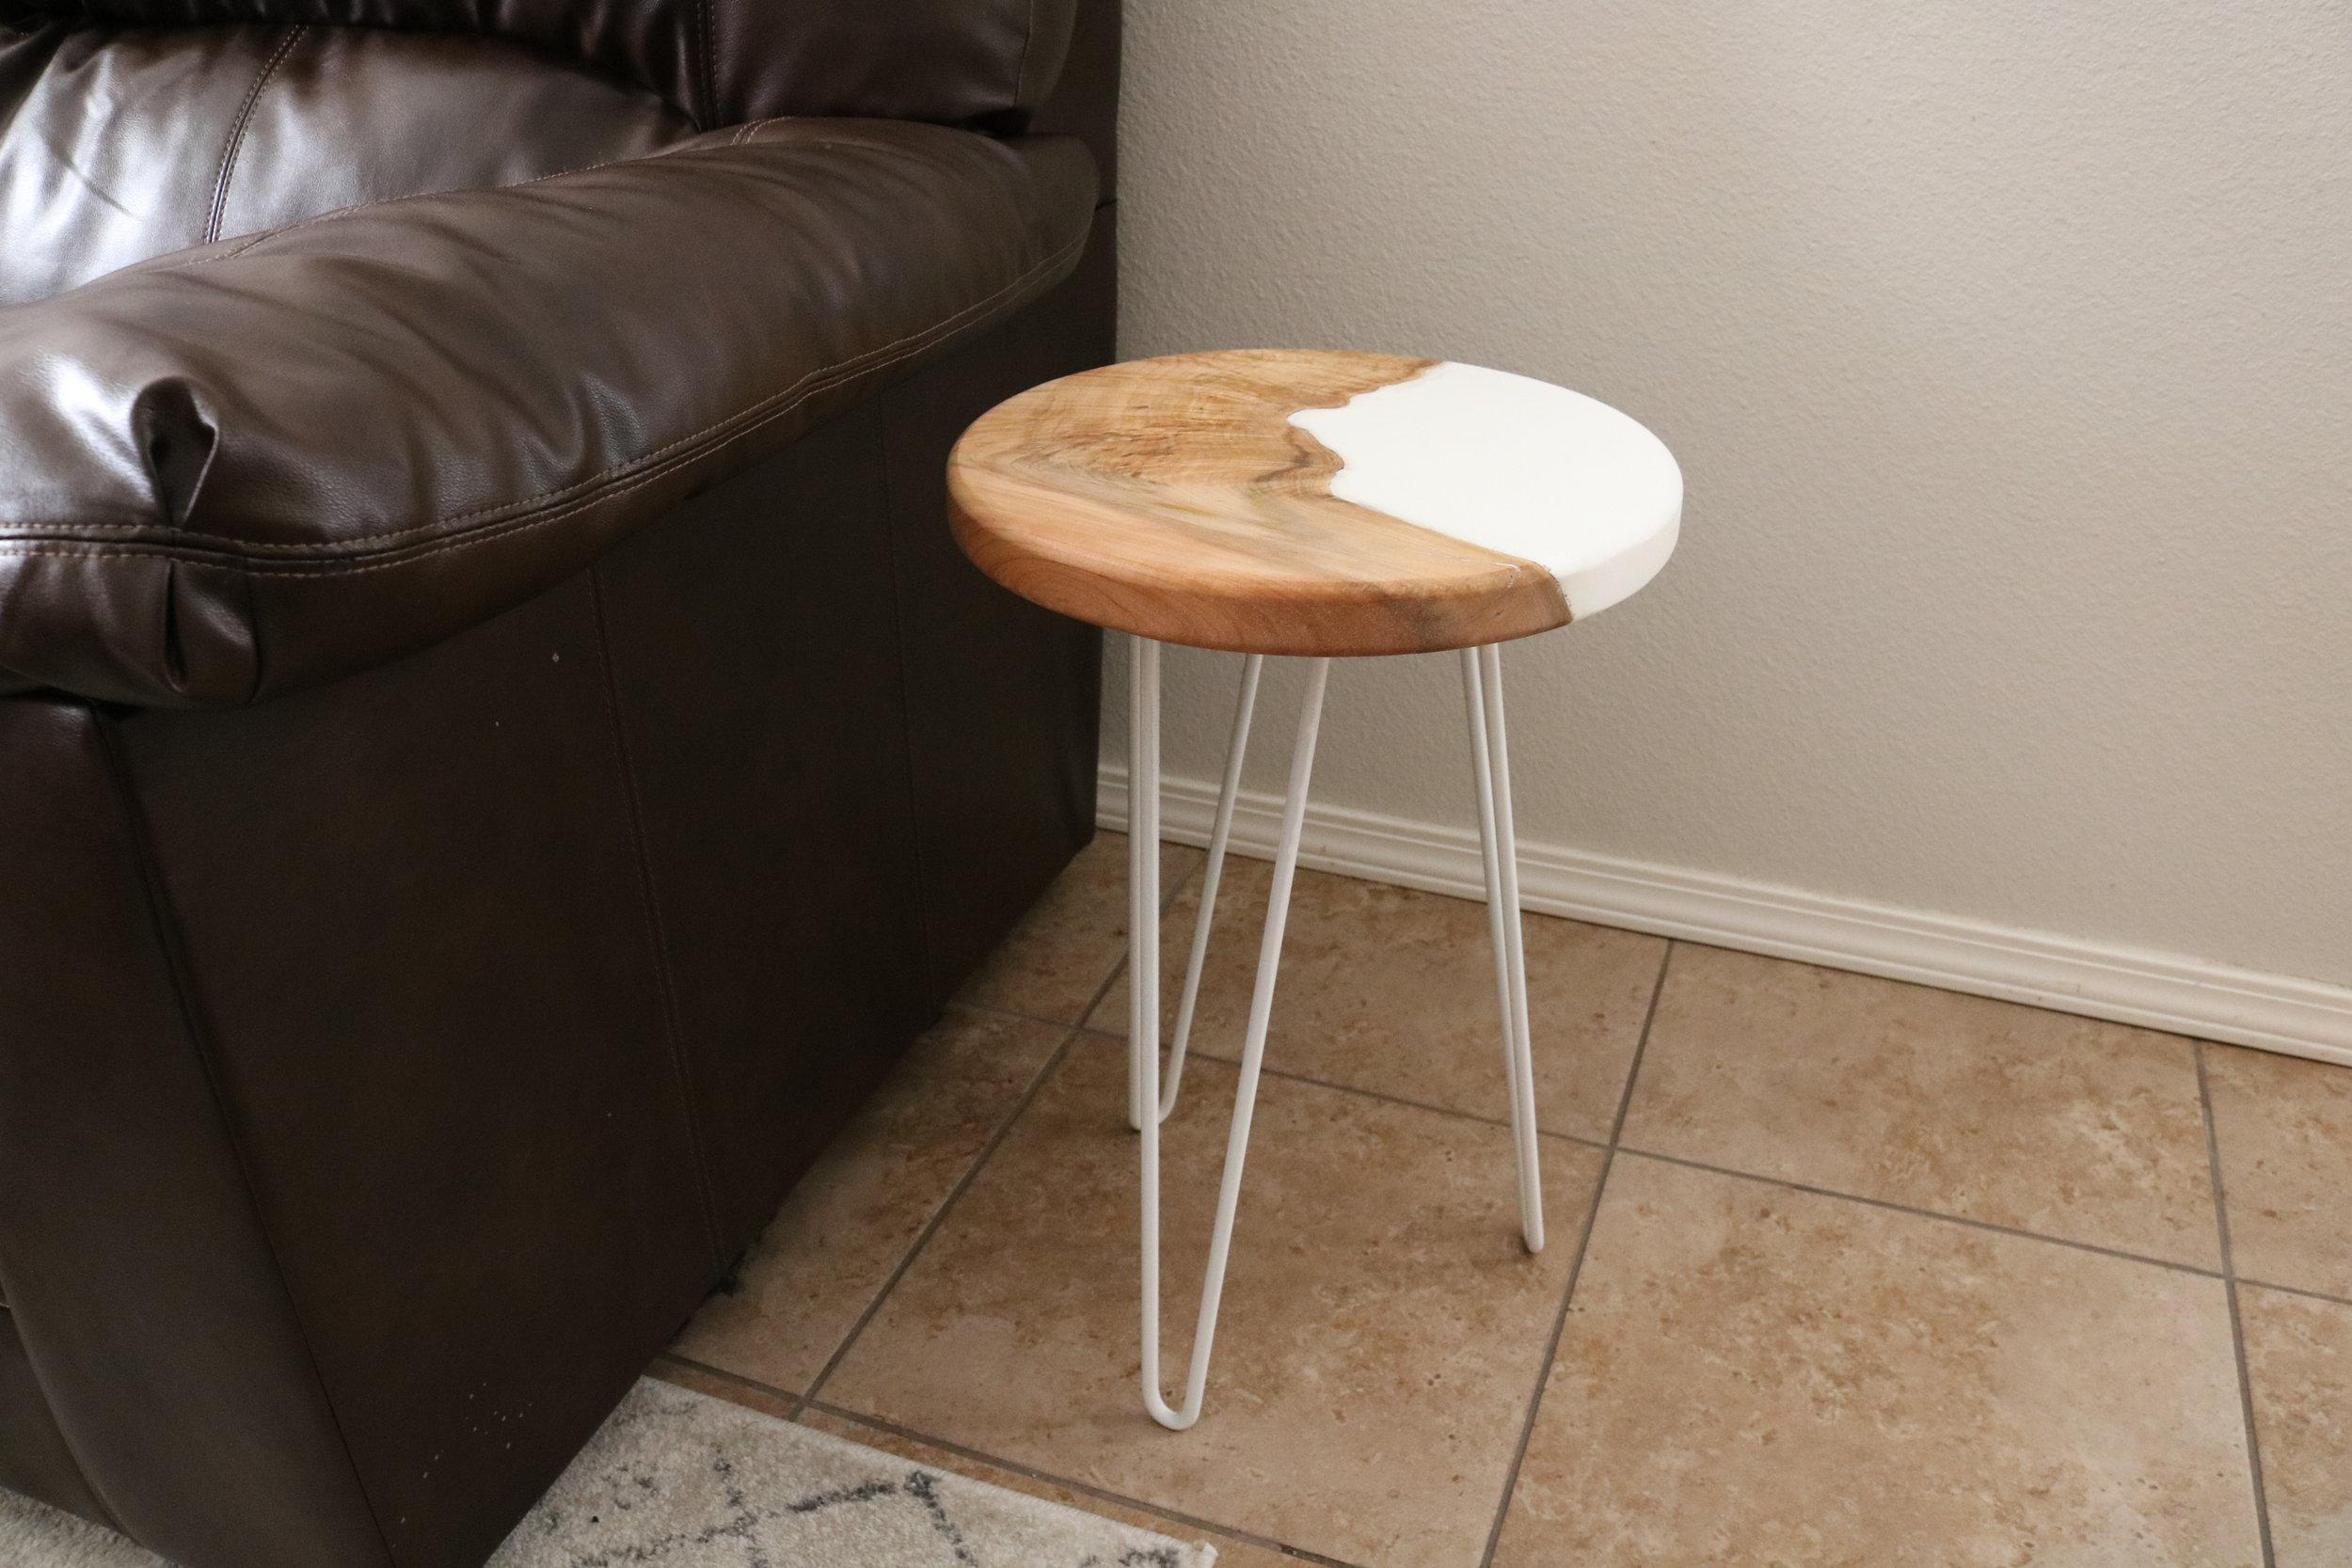 hairpin-legs-end-table.JPG